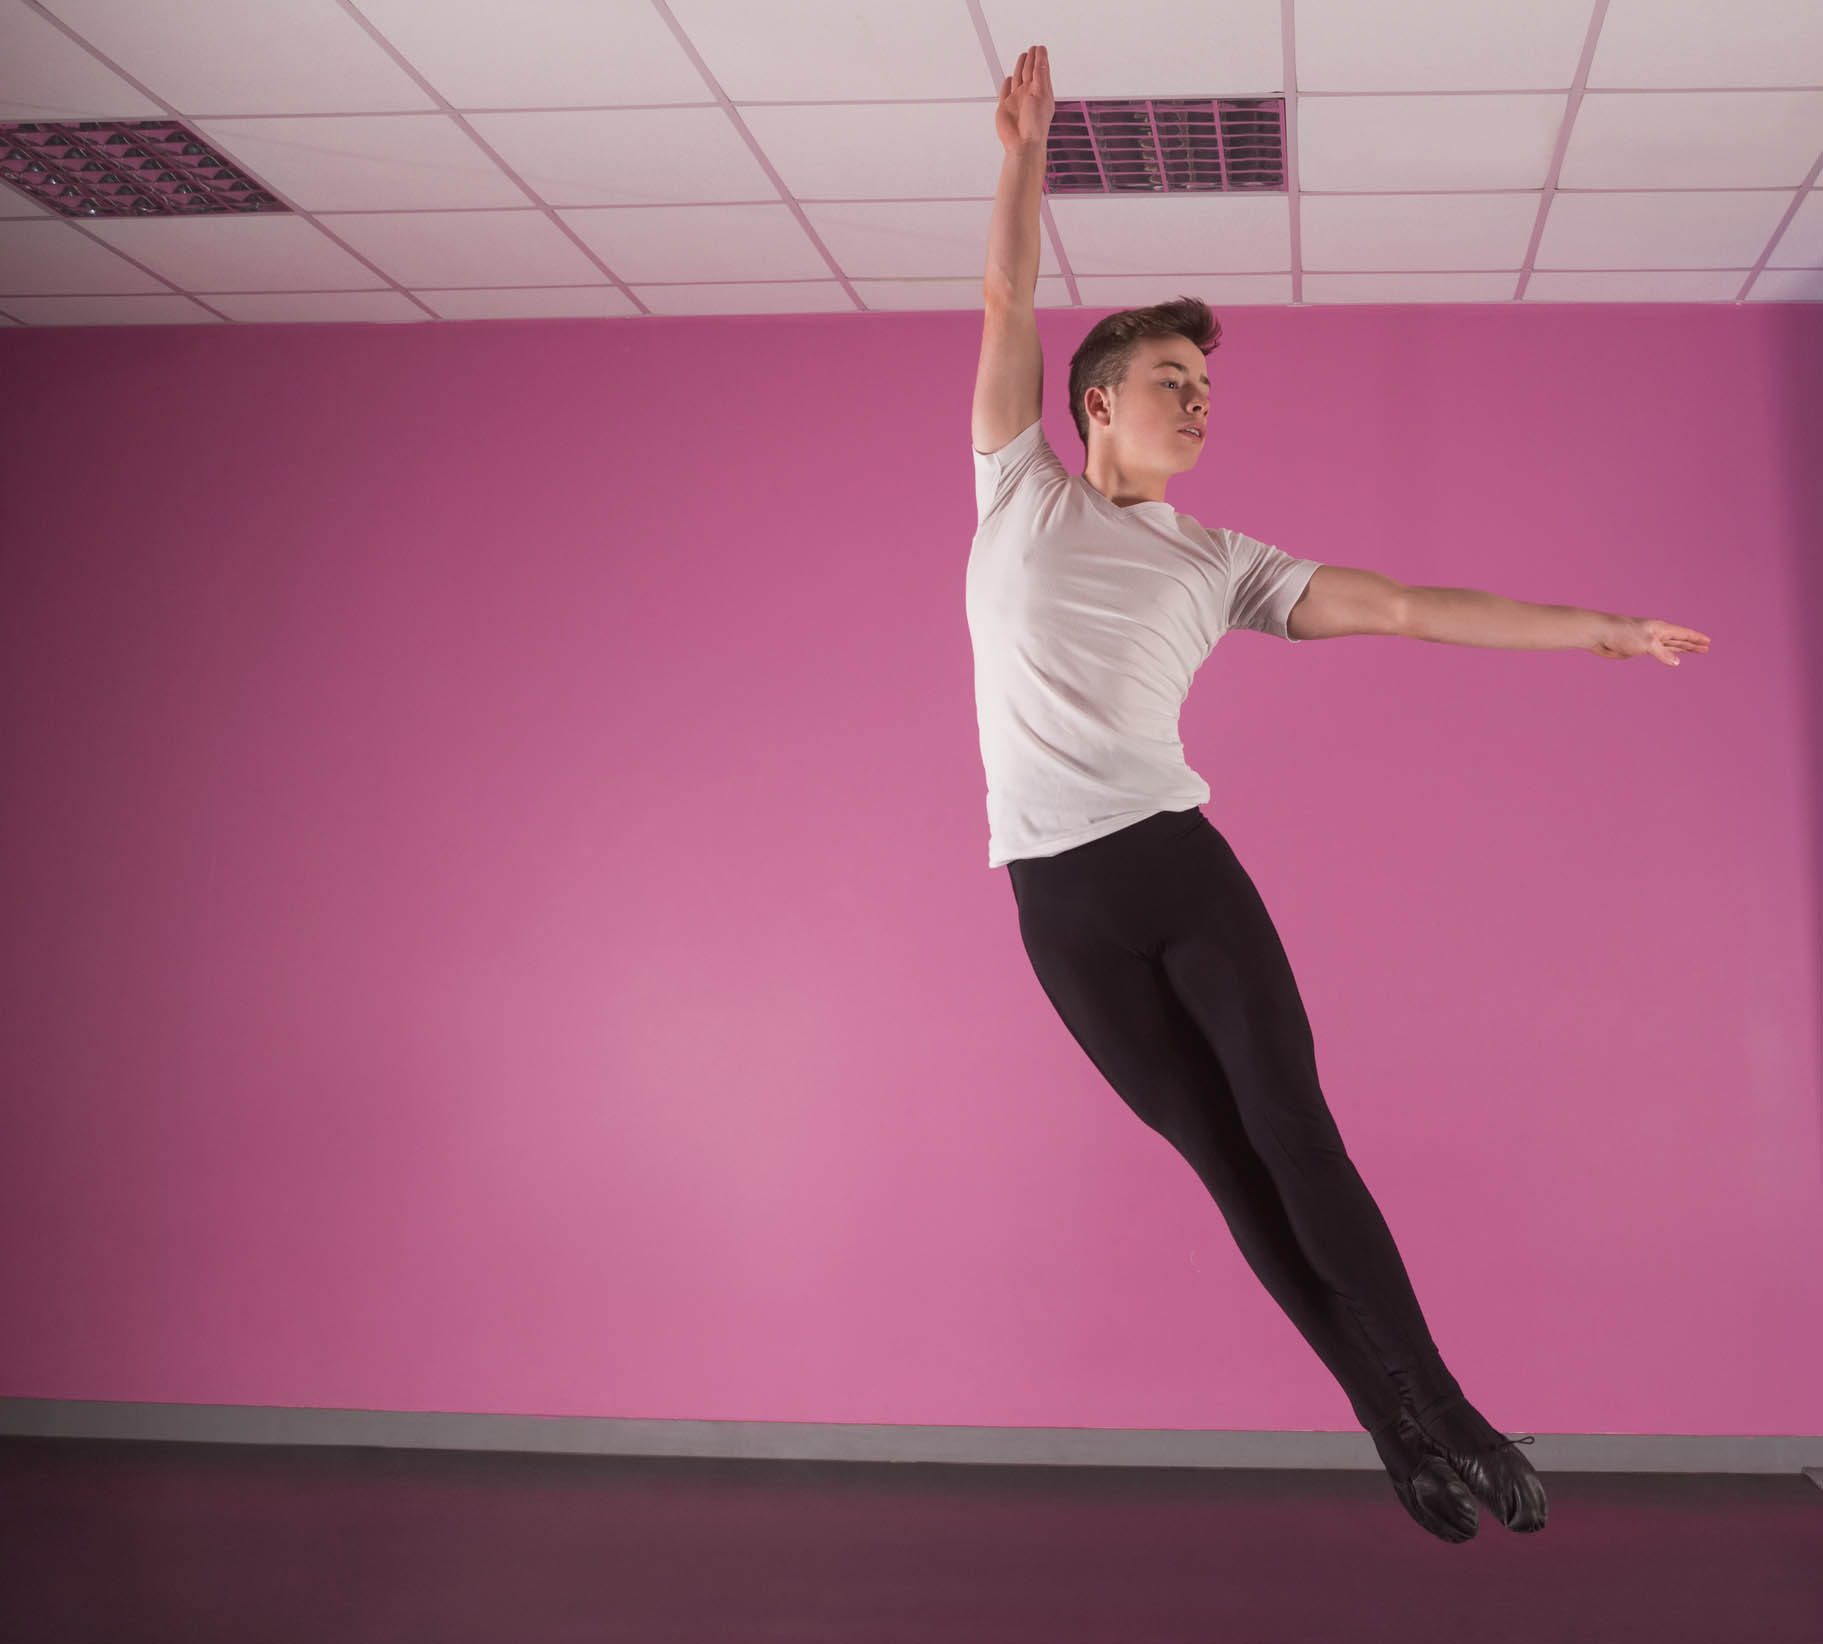 Why boys should enroll in dance class